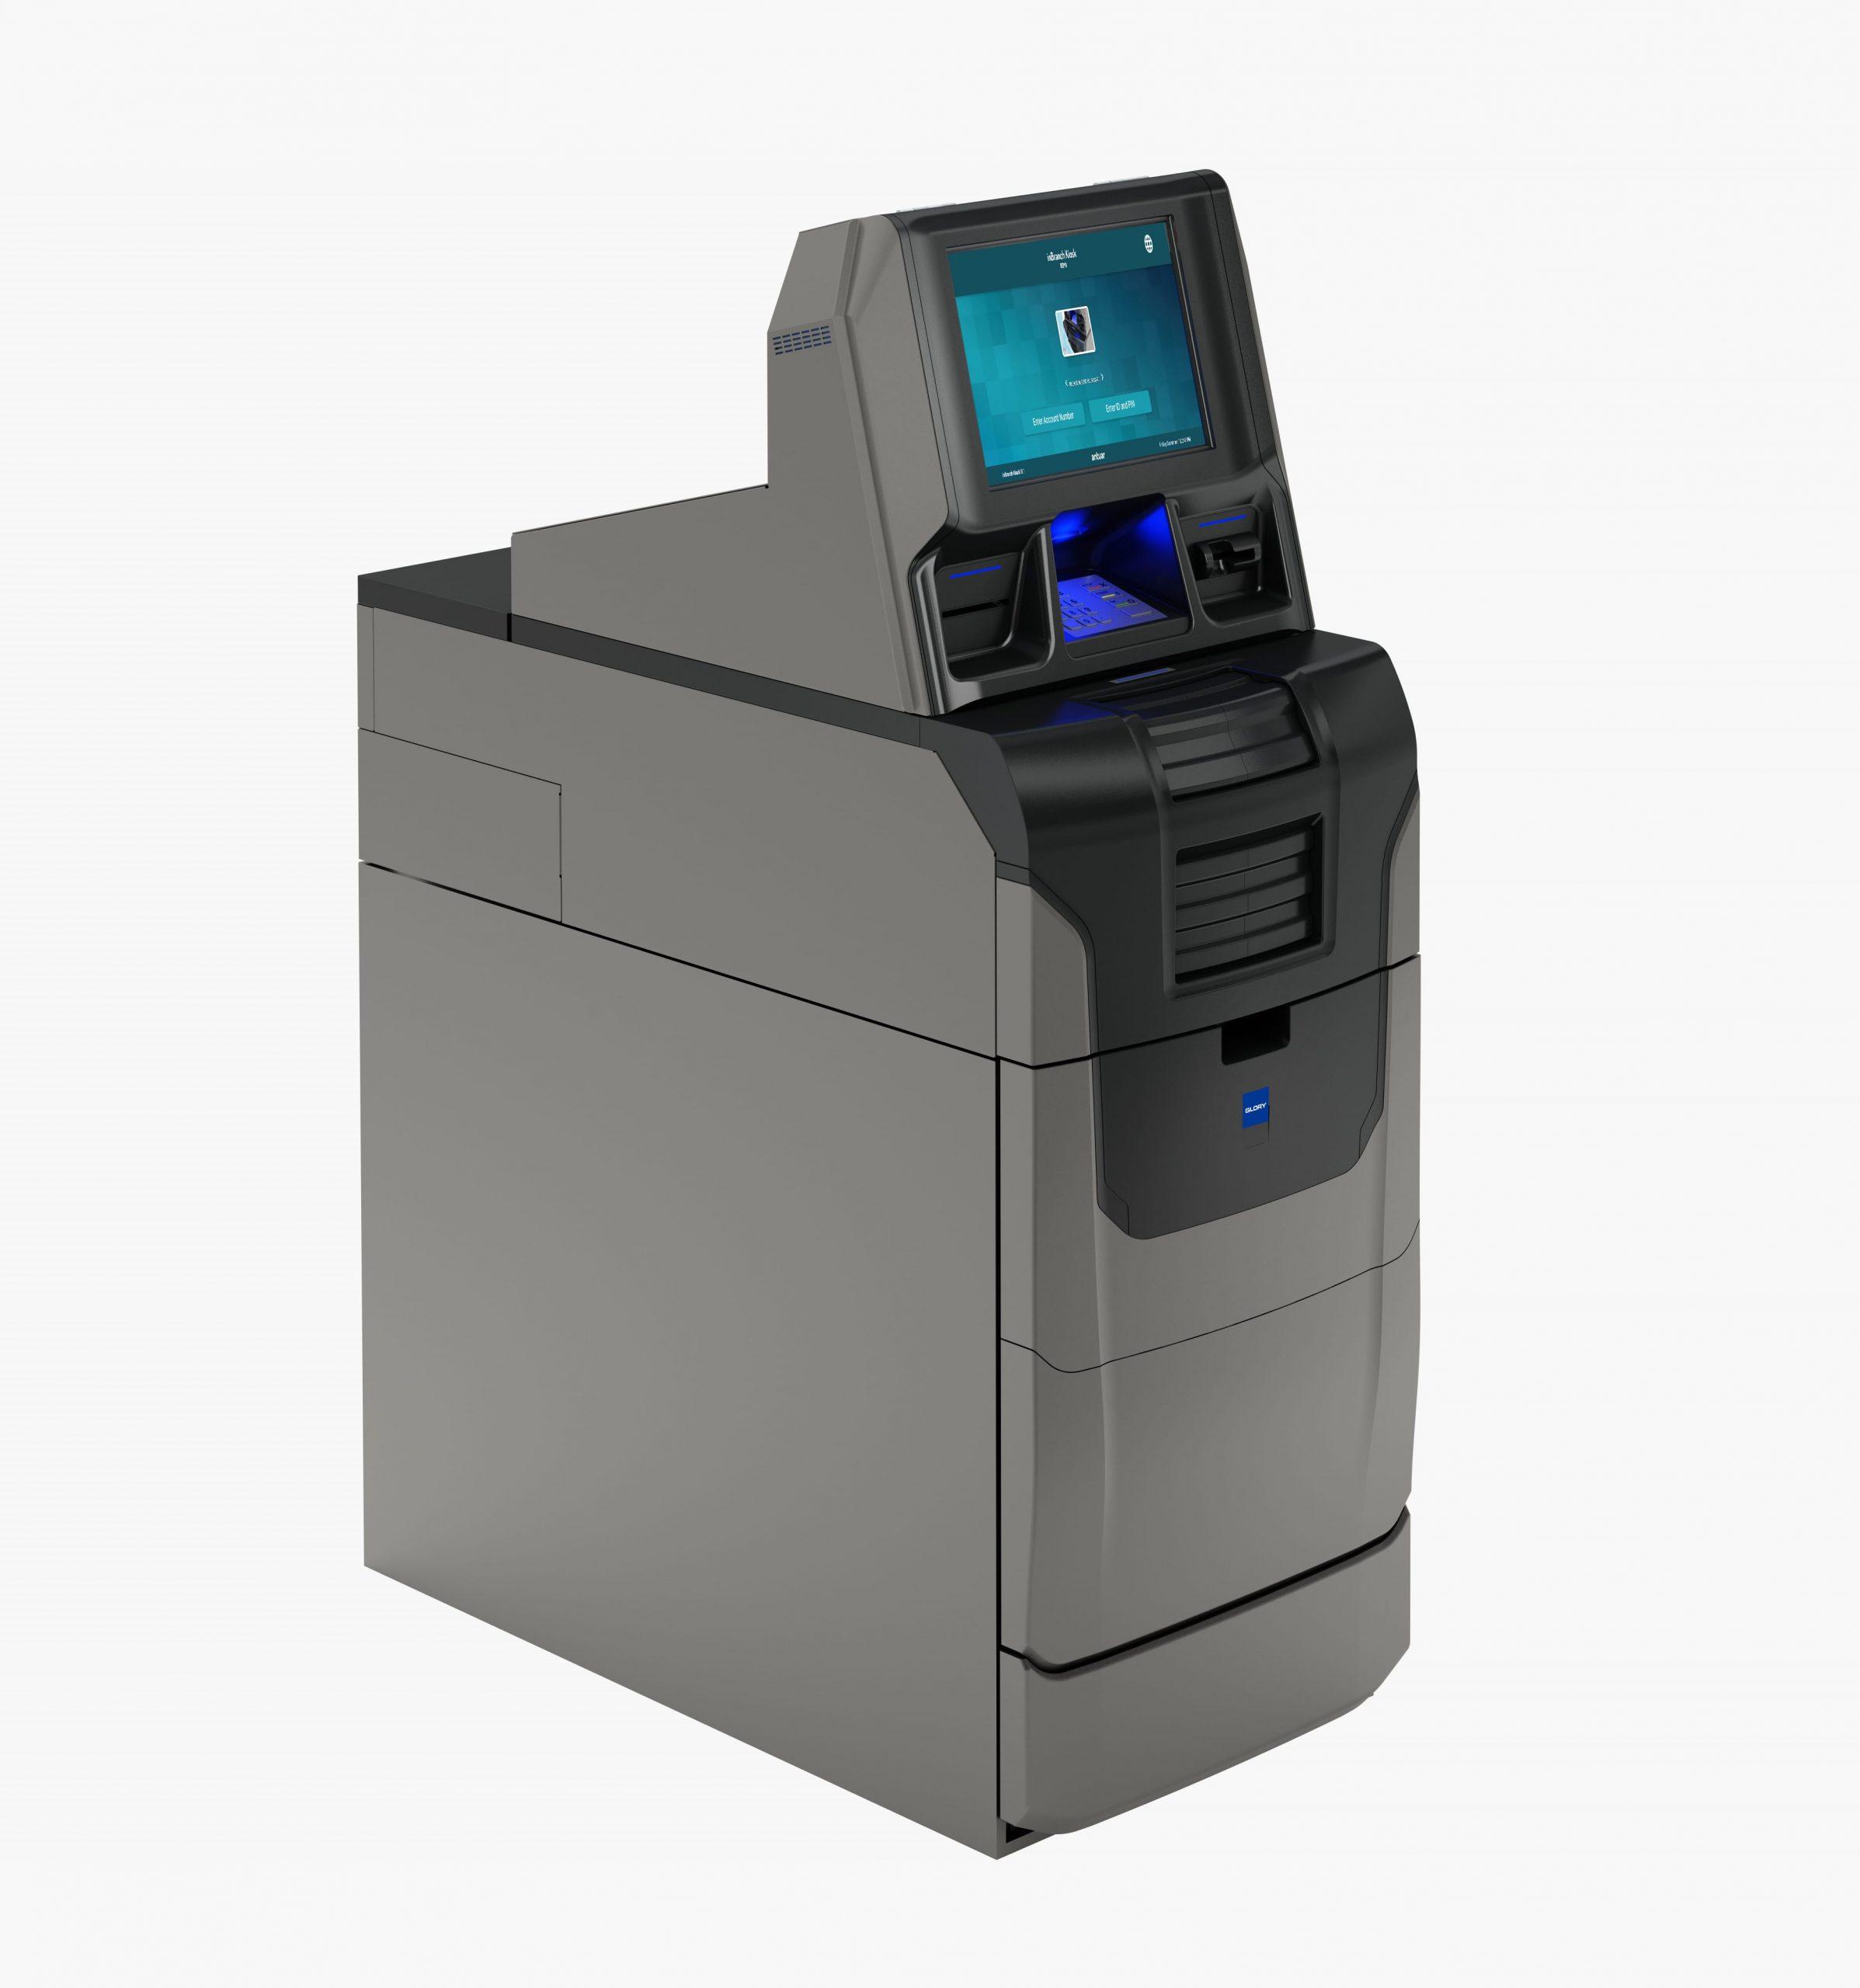 Depozitna mašina GDB-100